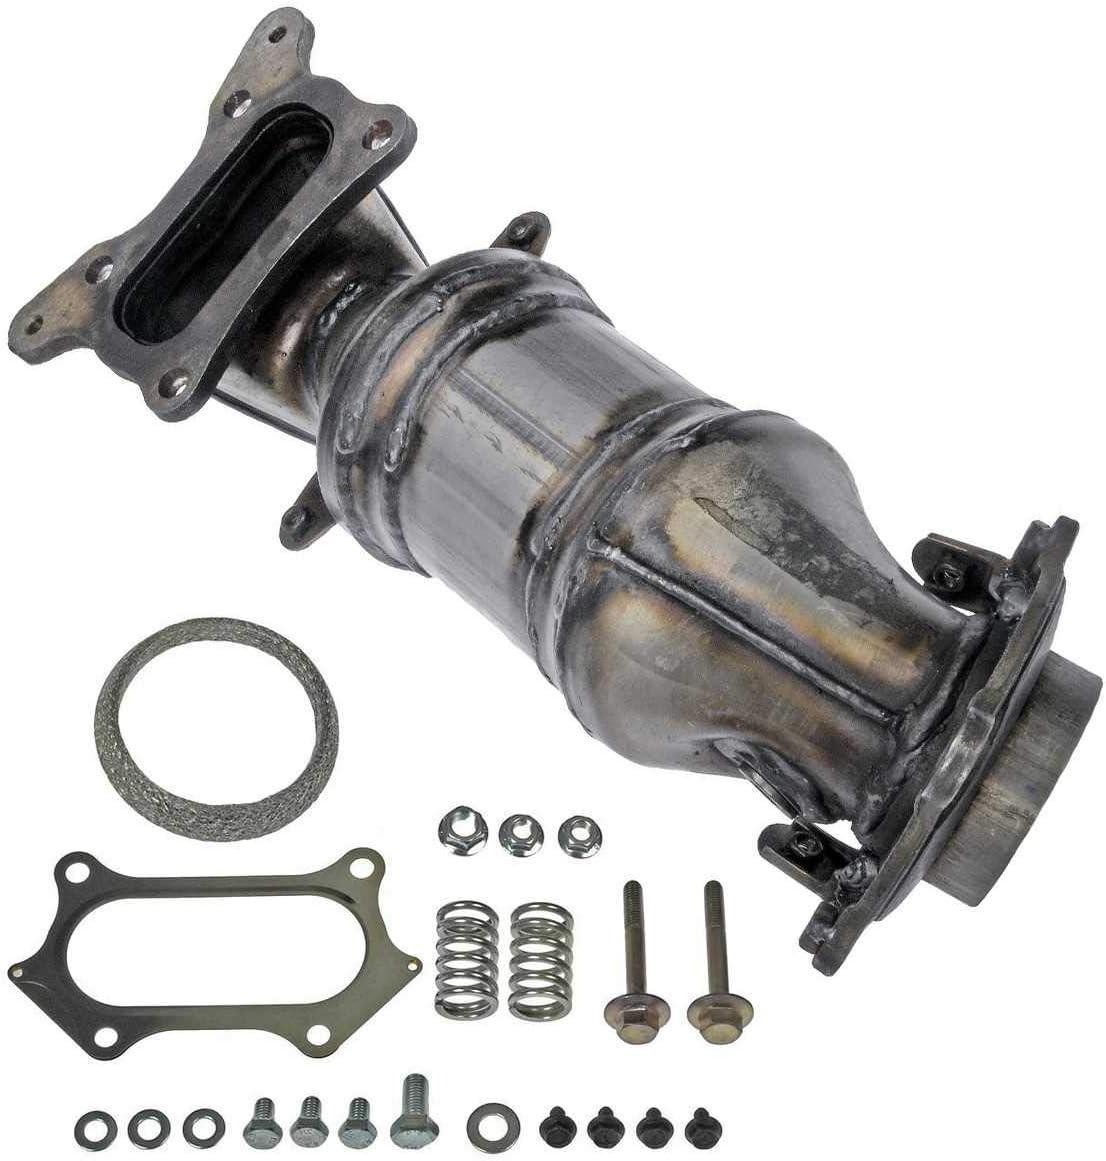 AutoShack EMCC774970 Exhaust Manifold with Catalytic Converter